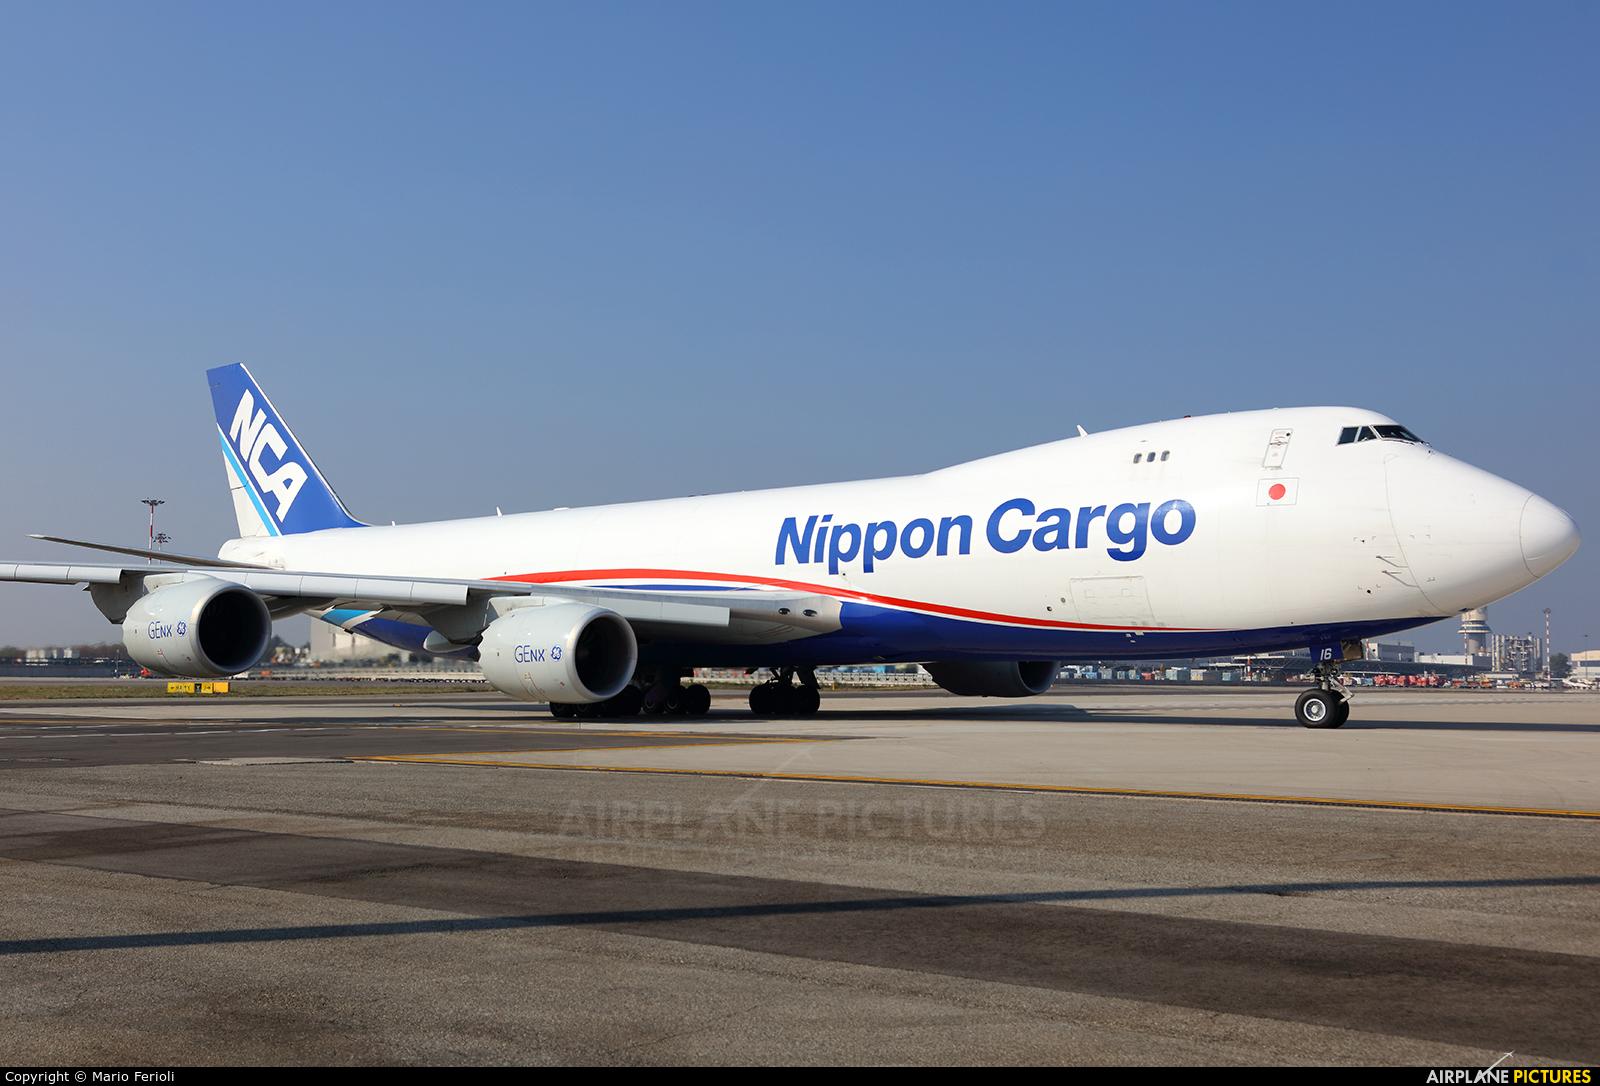 Nippon Cargo Airlines JA16KZ aircraft at Milan - Malpensa